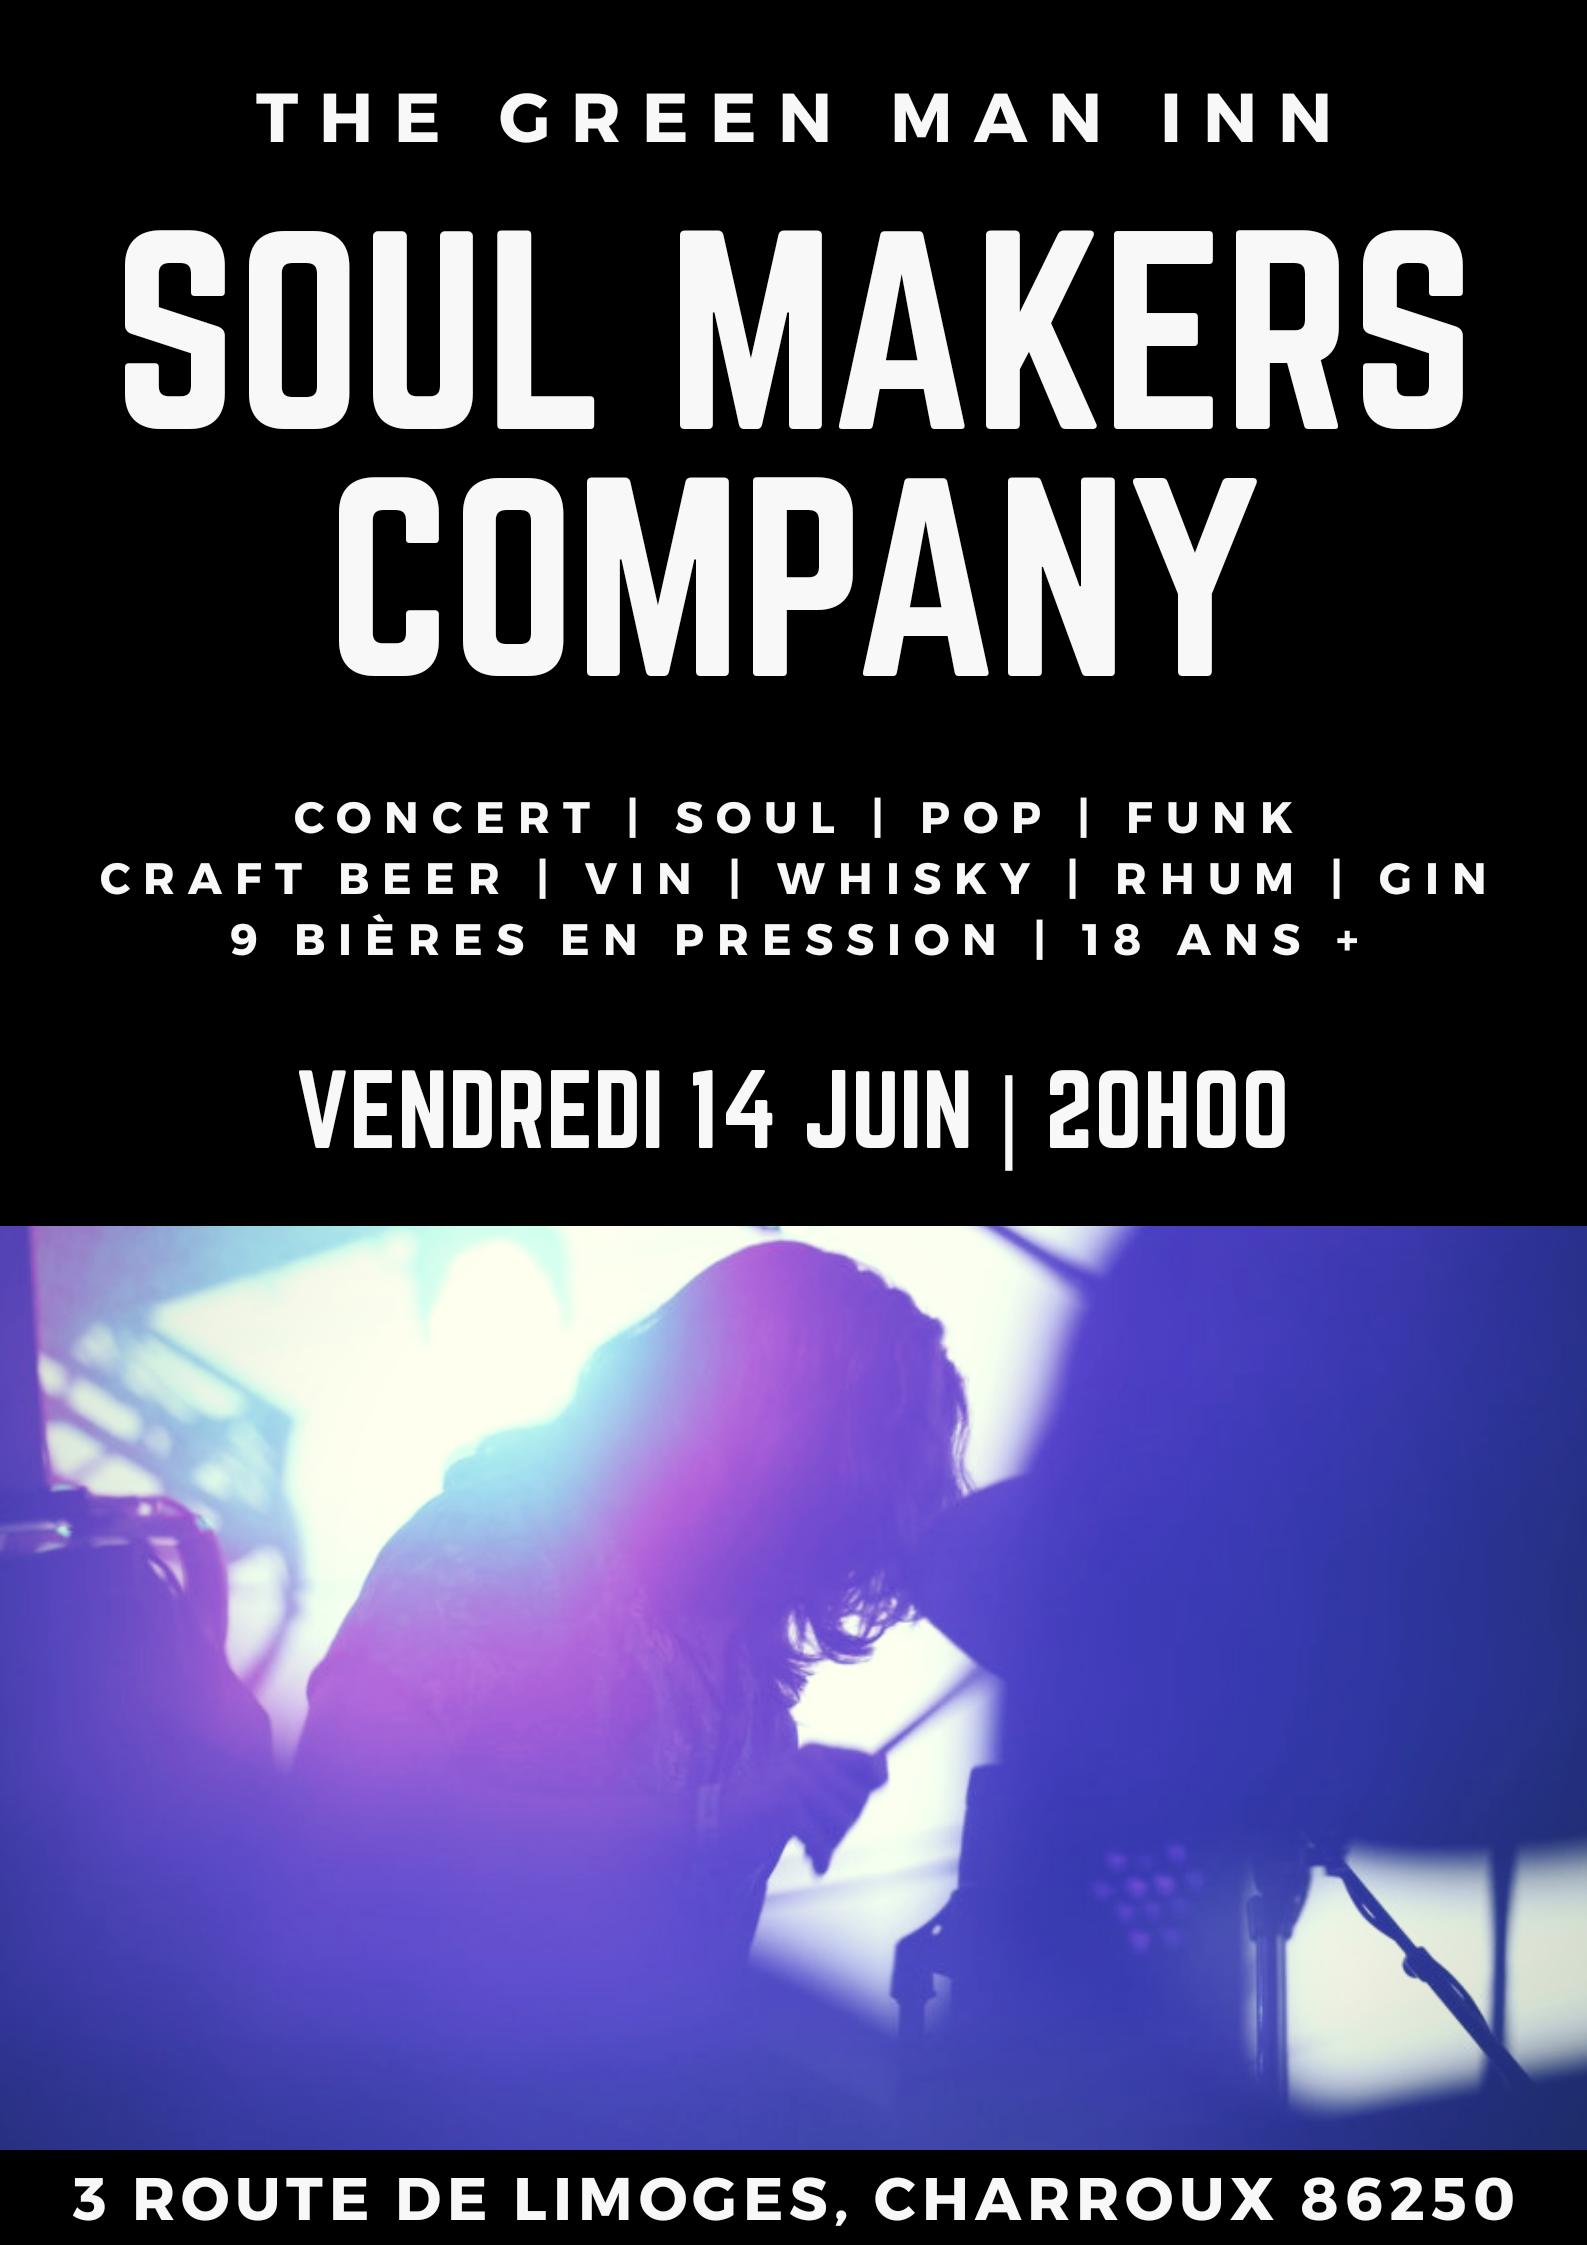 Soul Makers company